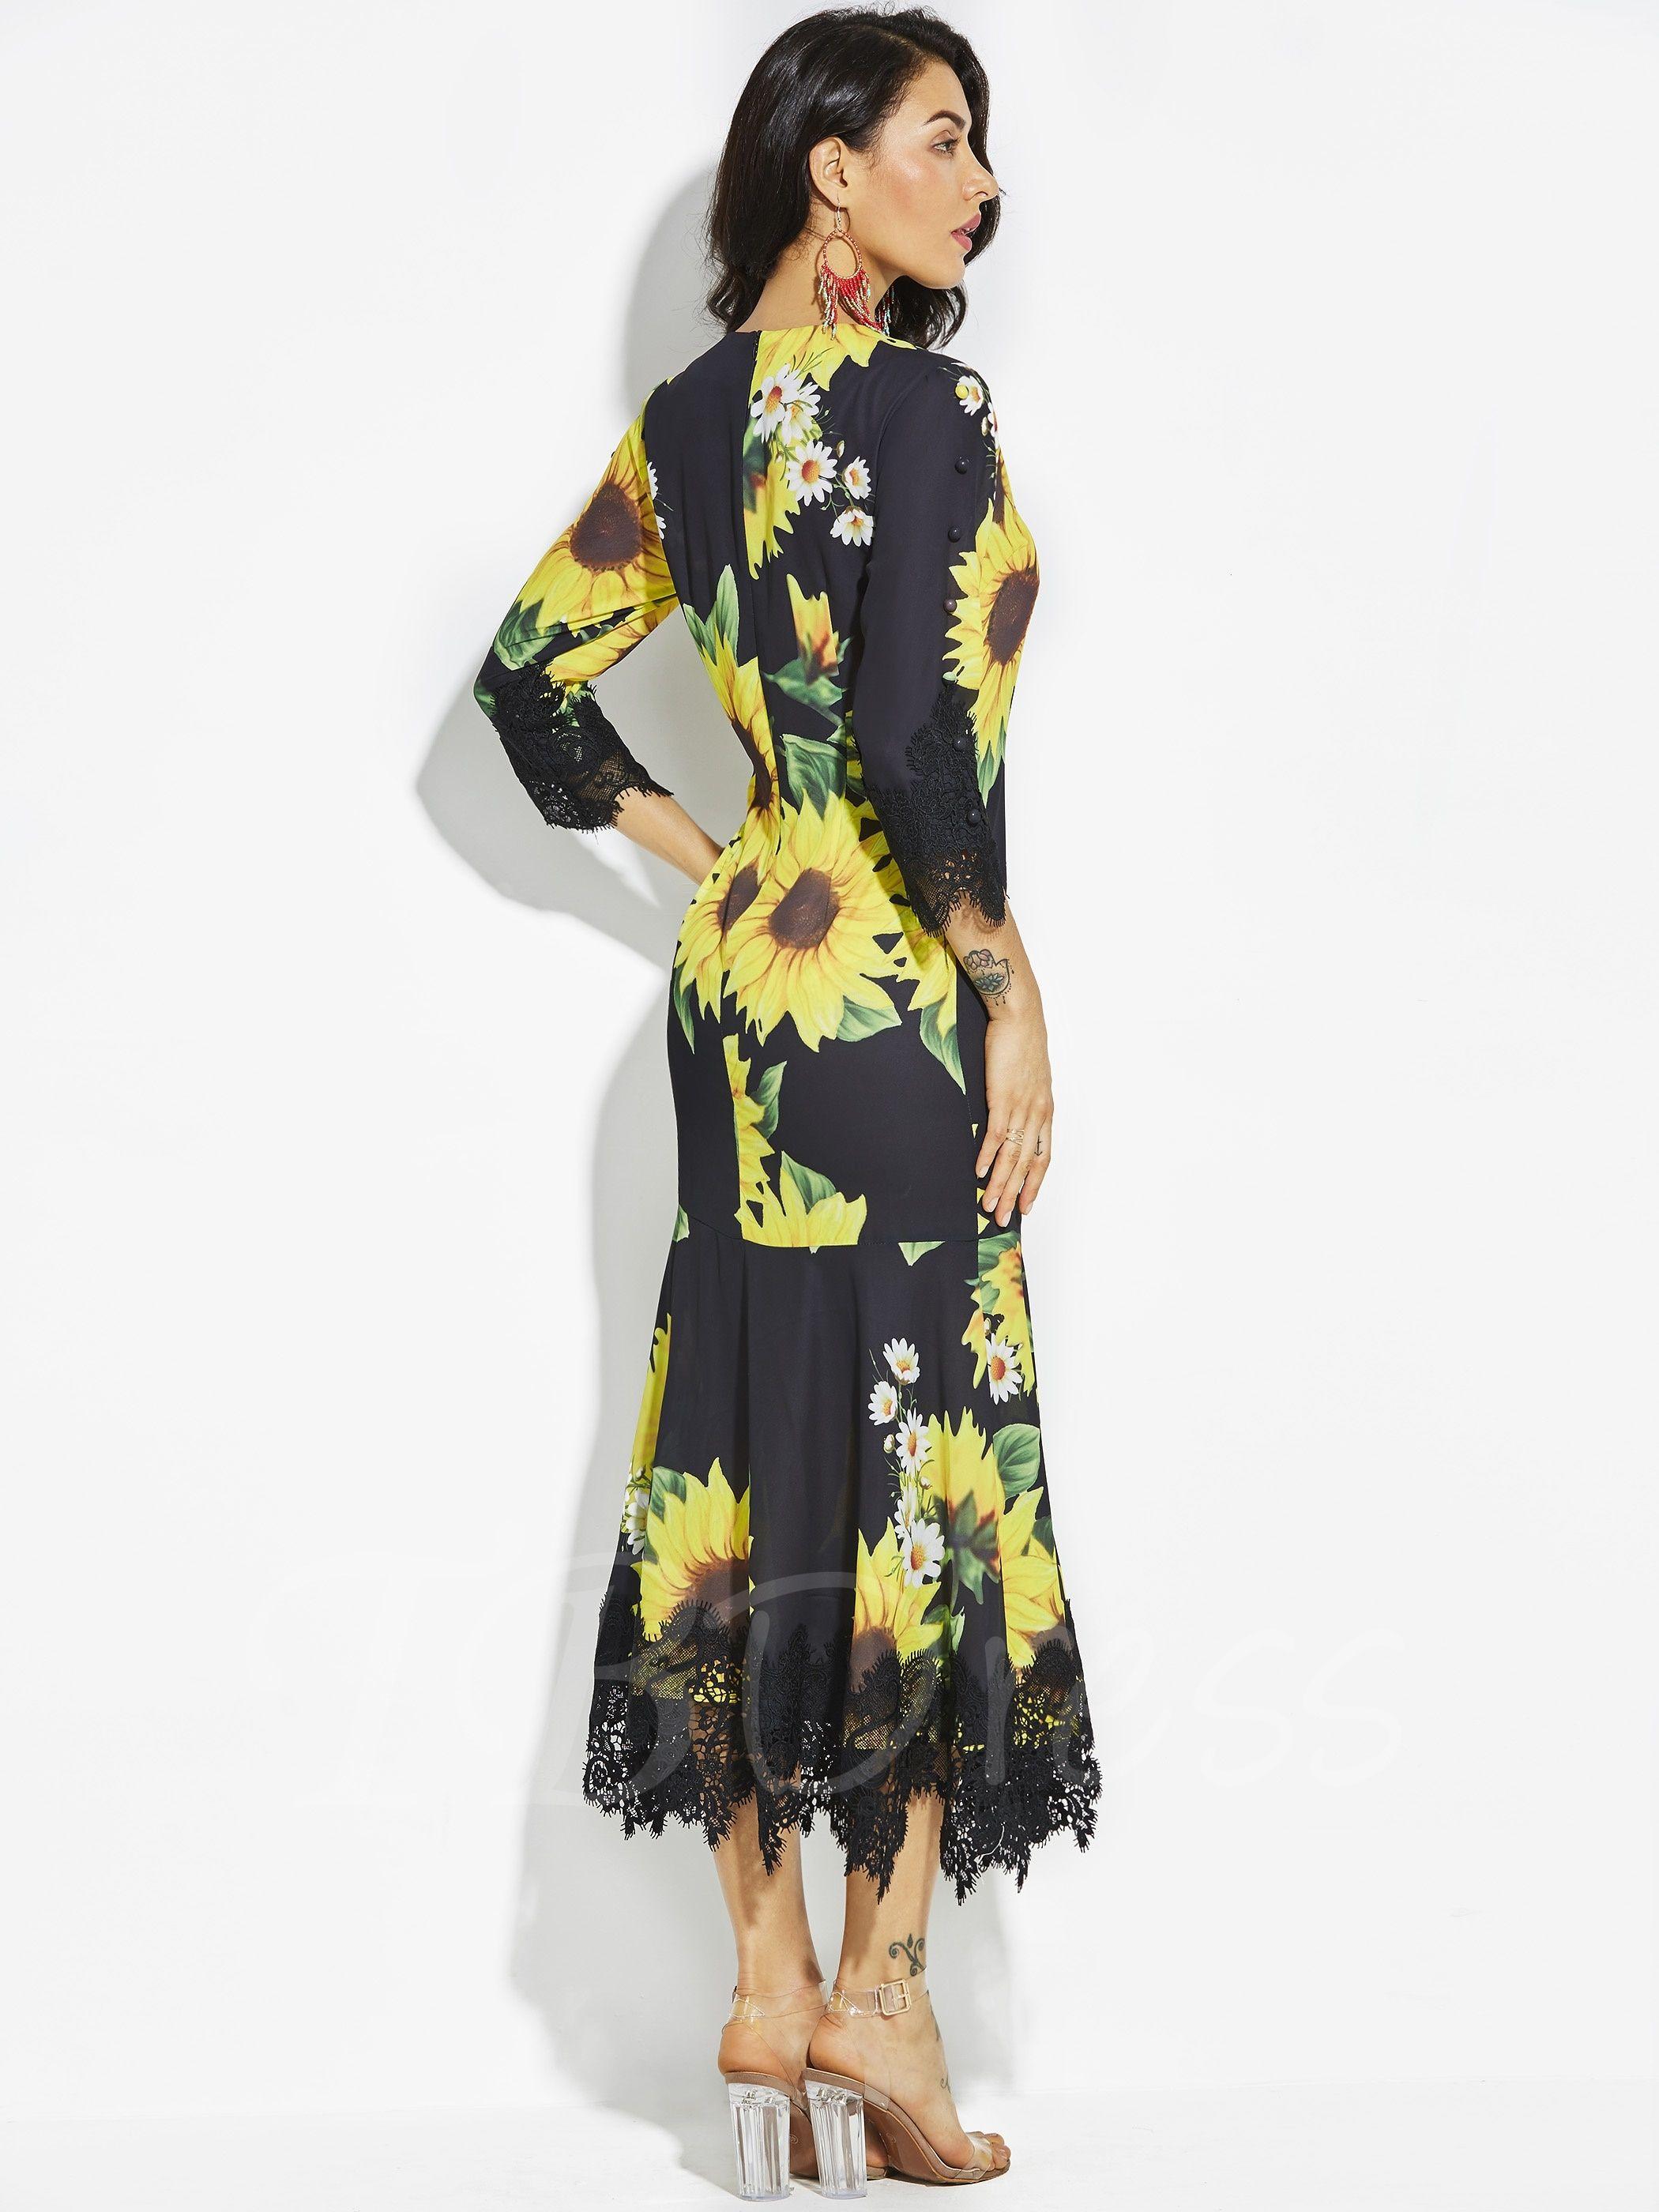 Round Neck Vacation Sunflower Print Women S Maxi Dress Womens Maxi Dresses Dresses Bridesmaid Dress Sizes [ 2800 x 2100 Pixel ]